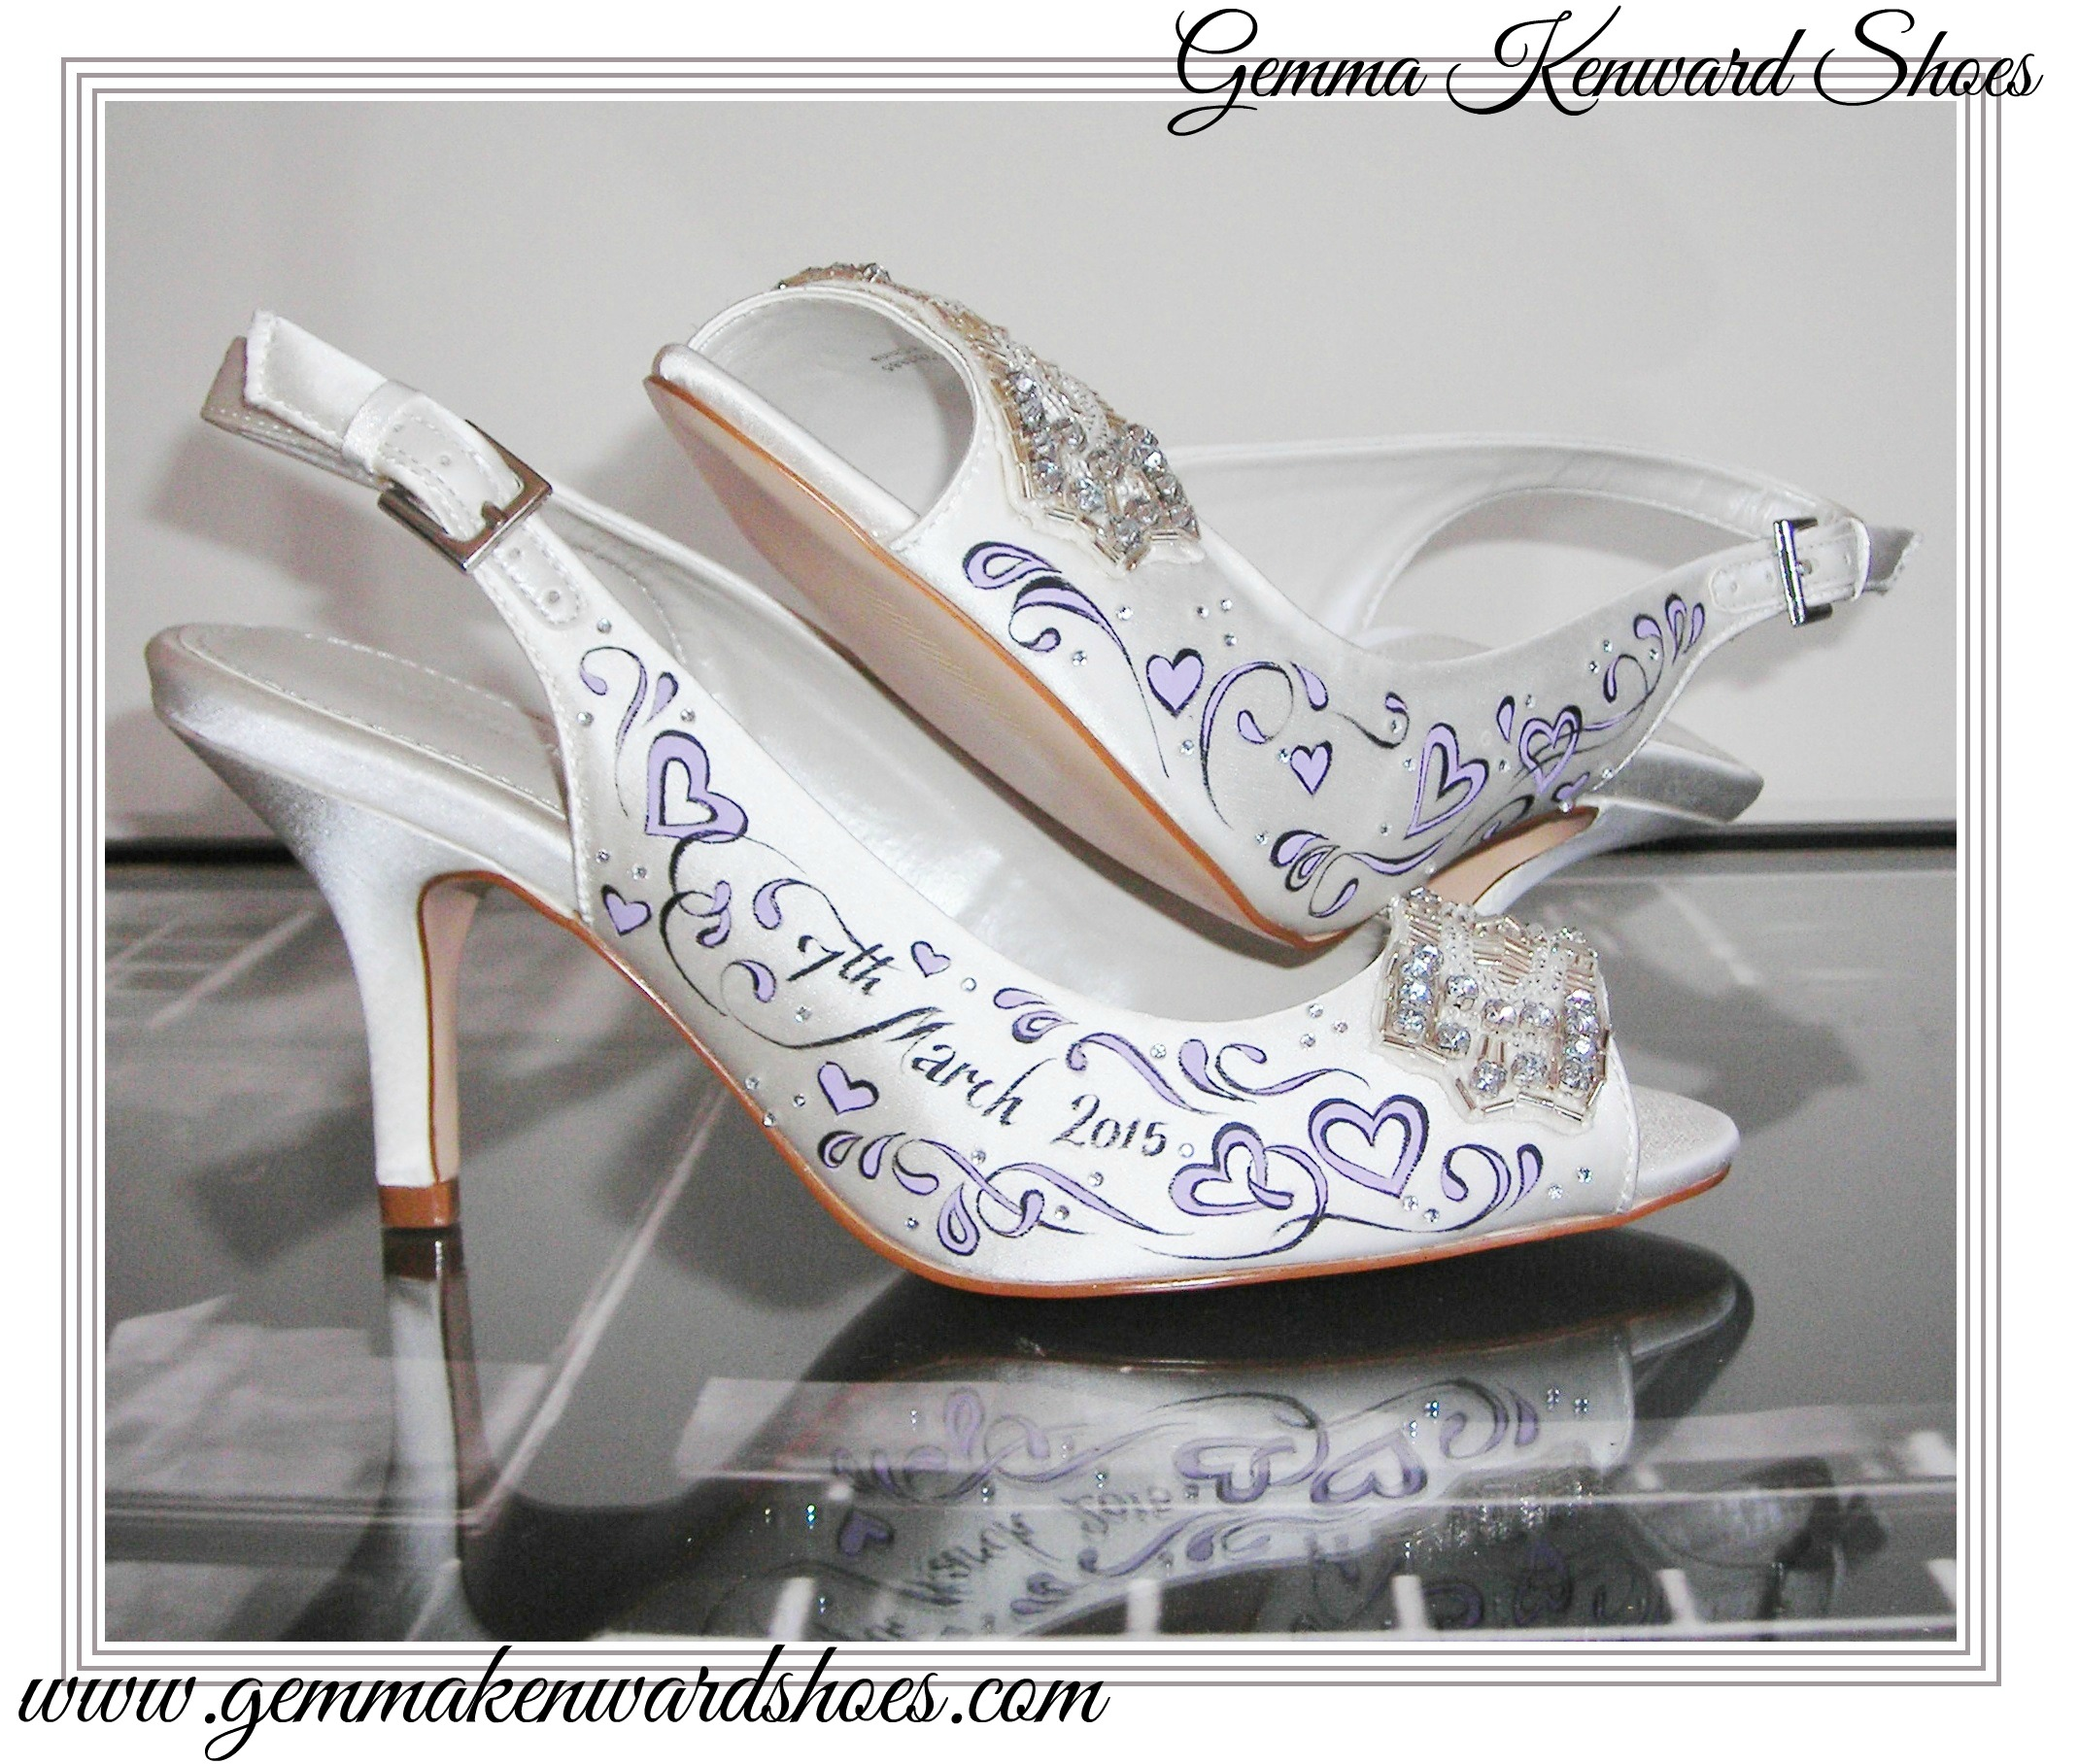 hand painted shoes slingbacks in liliac.JPG